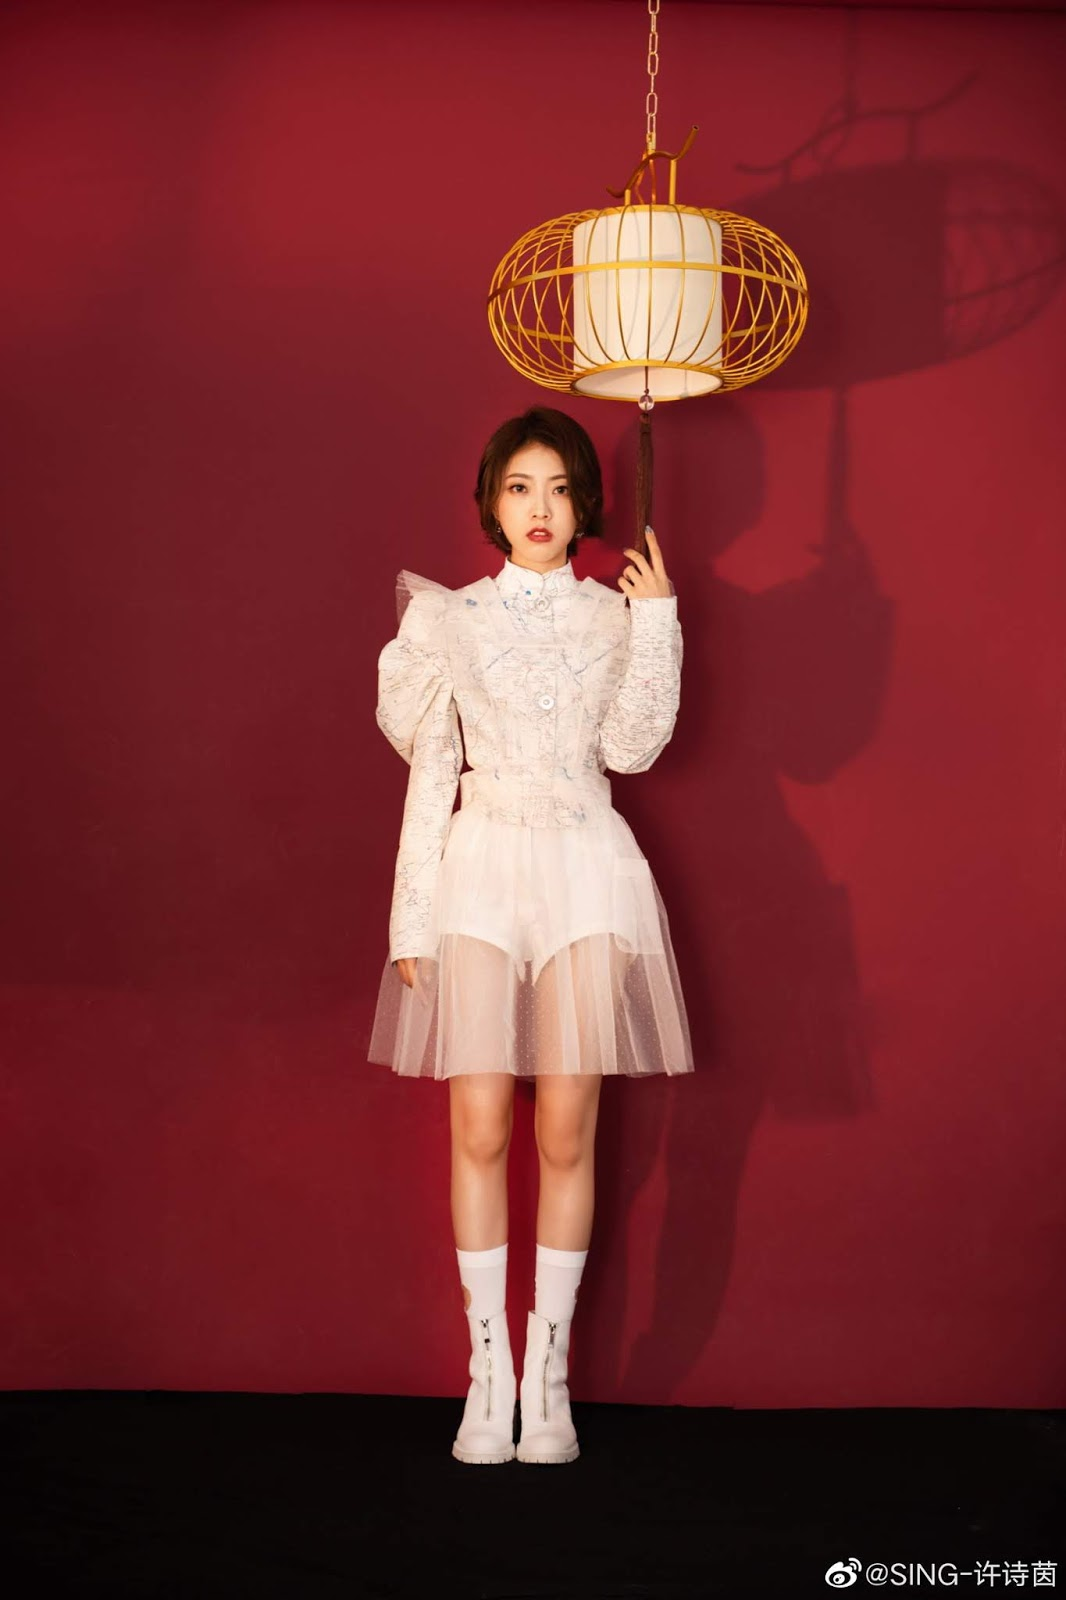 ☆SING☆繁星情報局SING-許詩茵「一生天涯」生写真